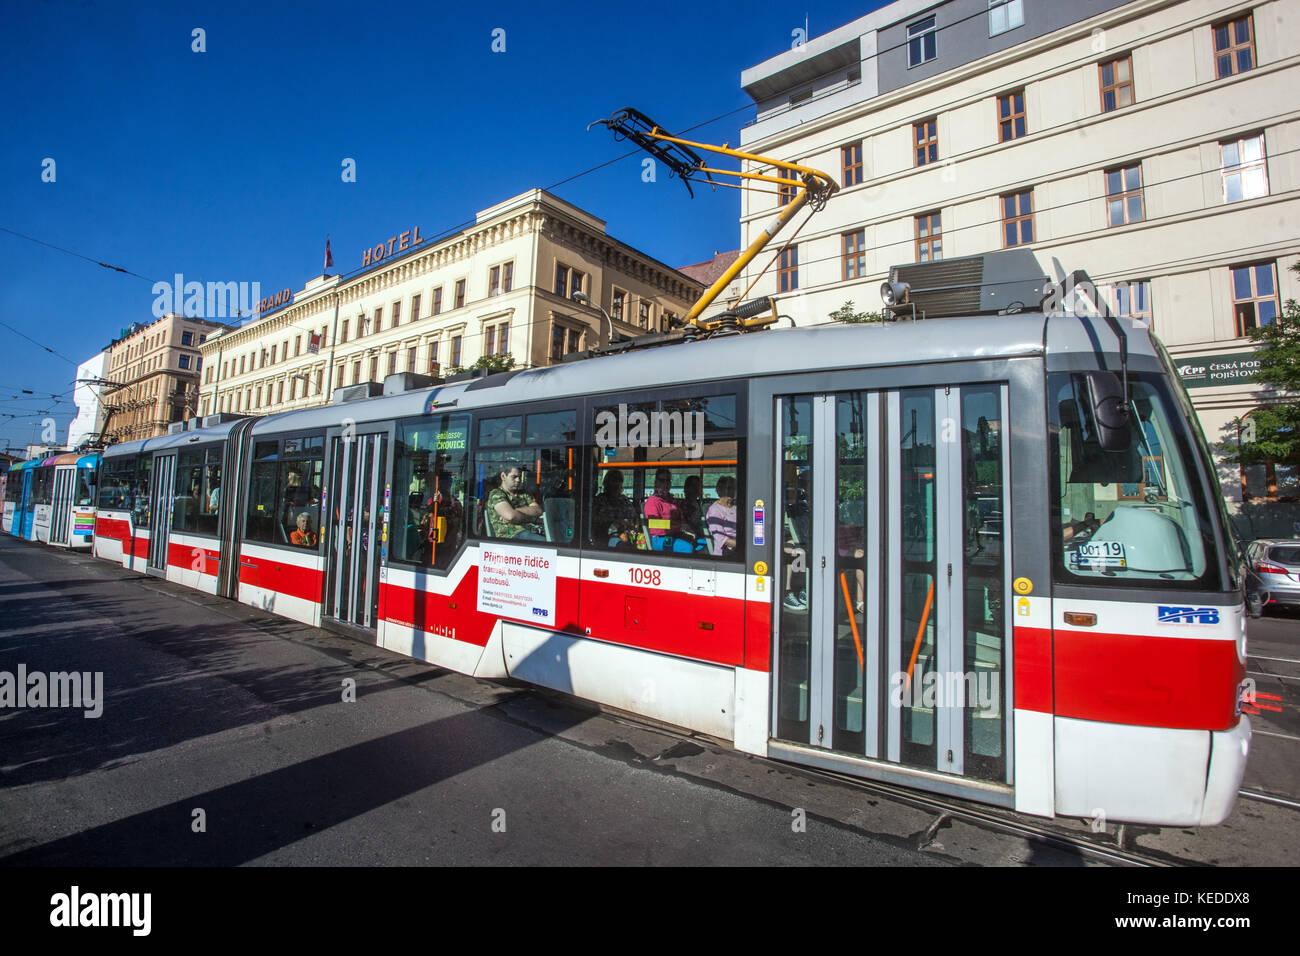 Tram on Benesova street in front of Grand Hotel, Brno, Czech Republic - Stock Image